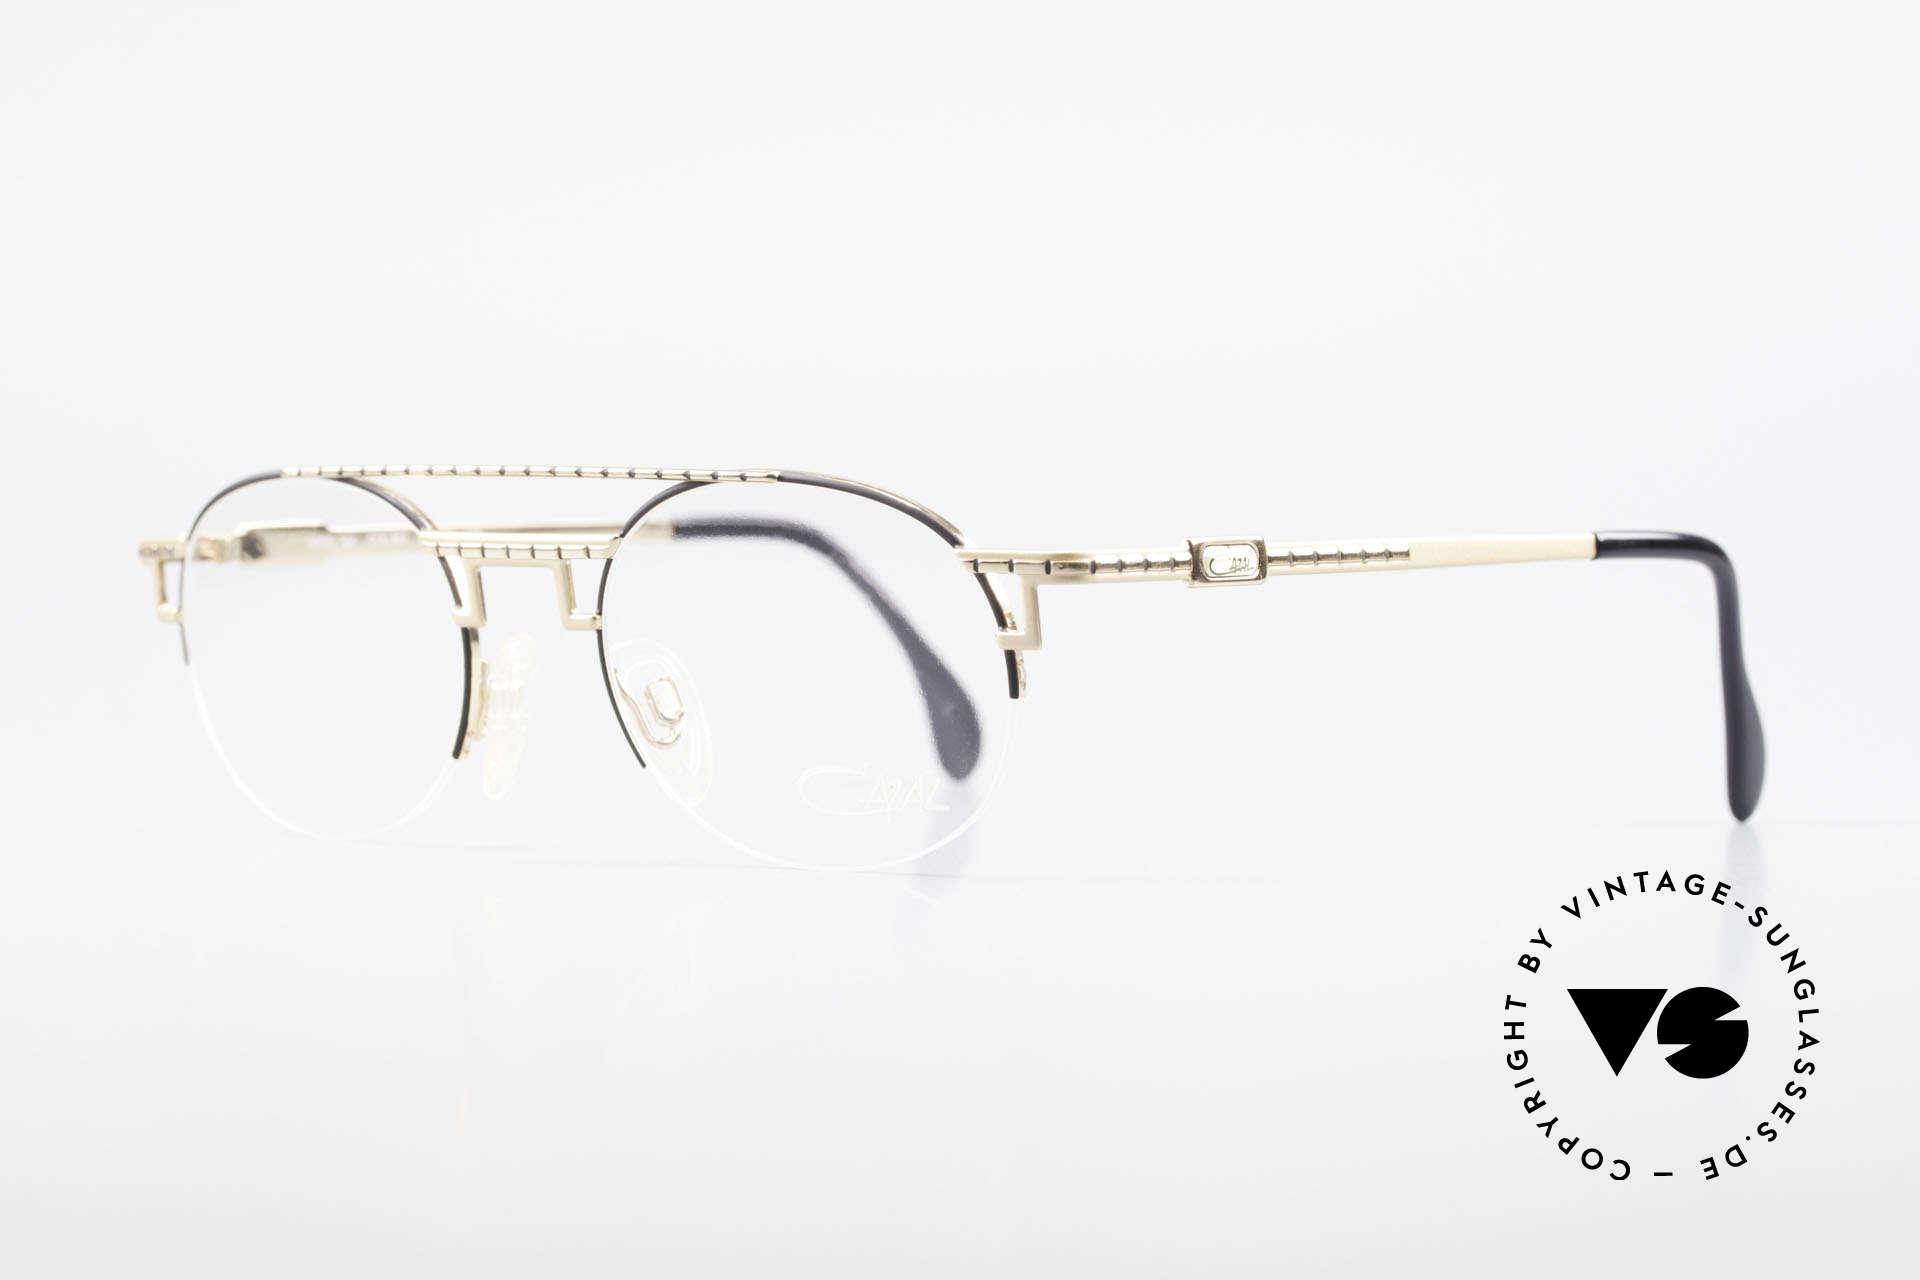 Cazal 764 True Vintage Cazal 90s Frame, top-notch craftsmanship (made in Germany), Made for Men